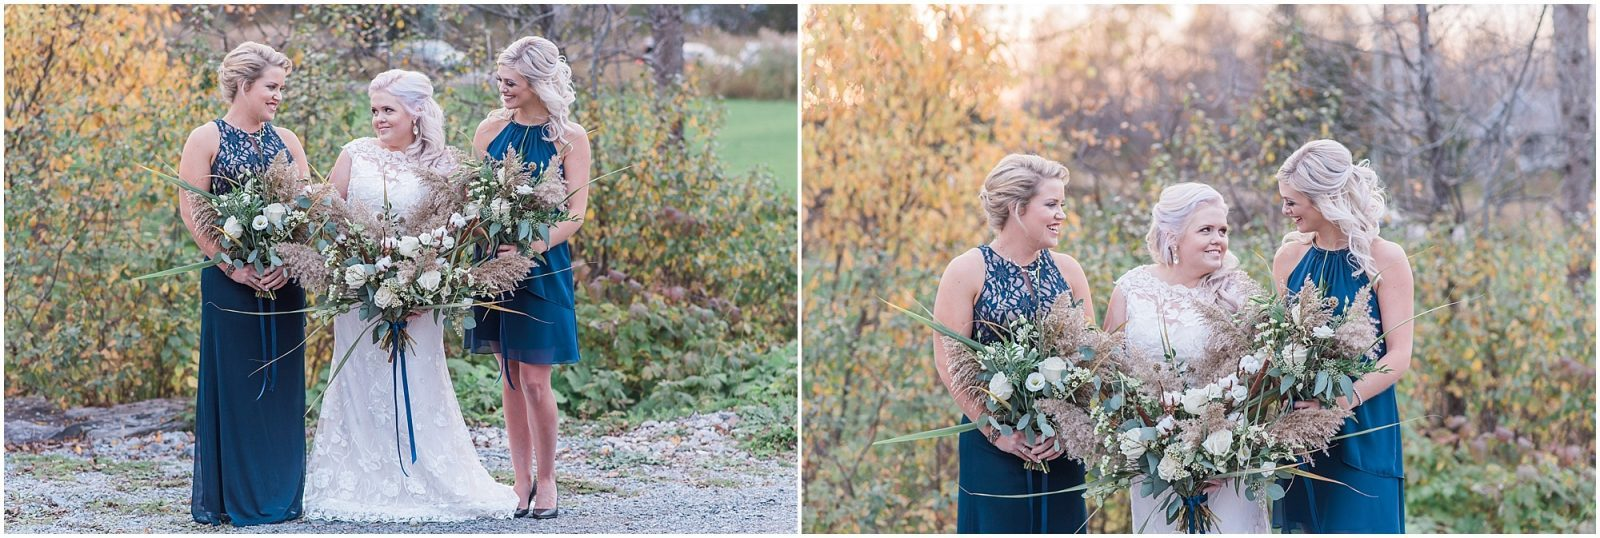 0057 Bethany and Luc - Fall Backyard Ottawa Wedding - Copper and Navy - PhotosbyEmmaH.jpg